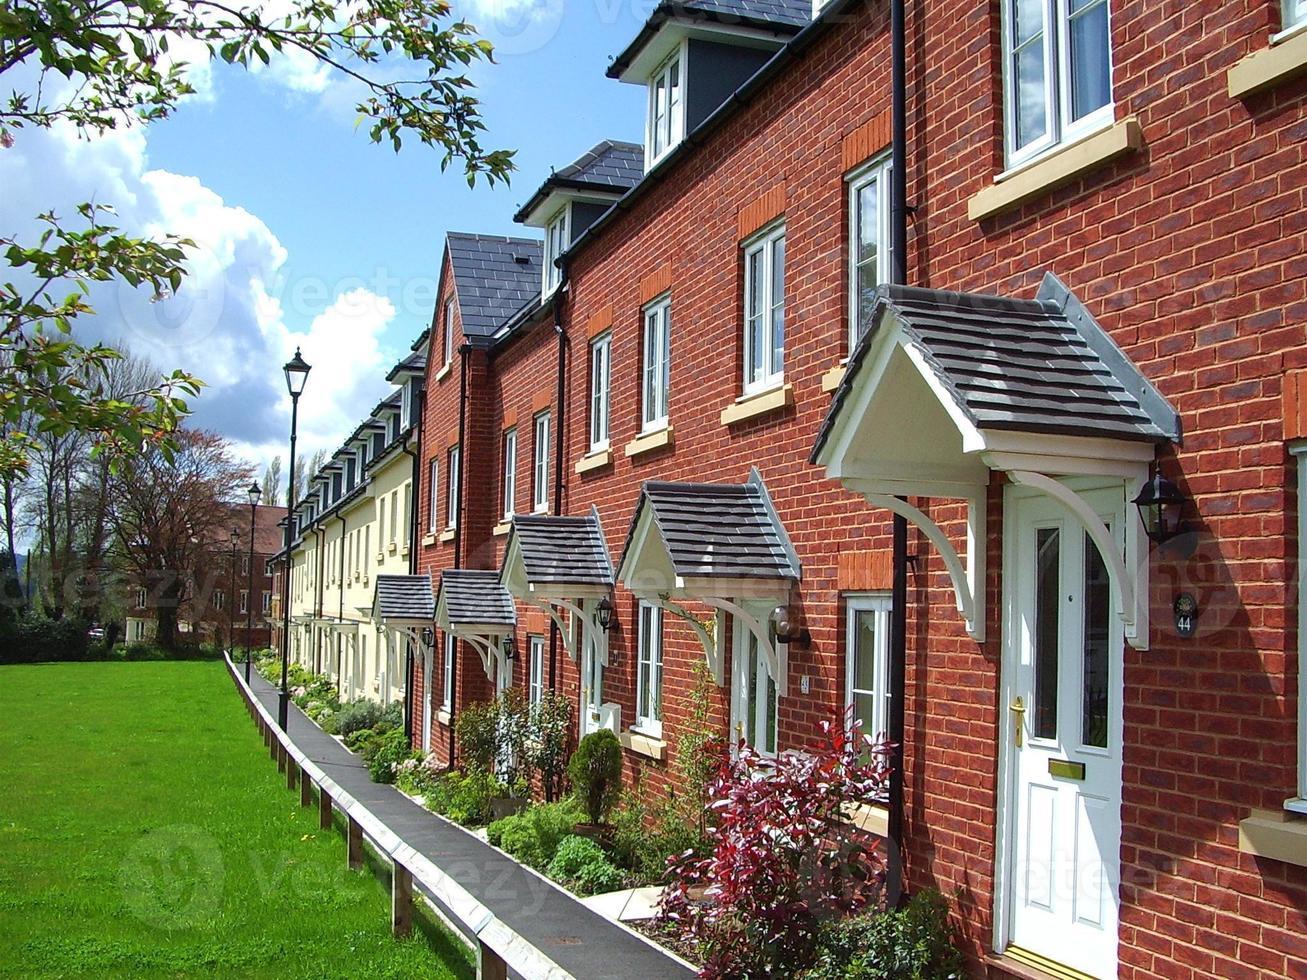 21st Century Terrace Homes photo